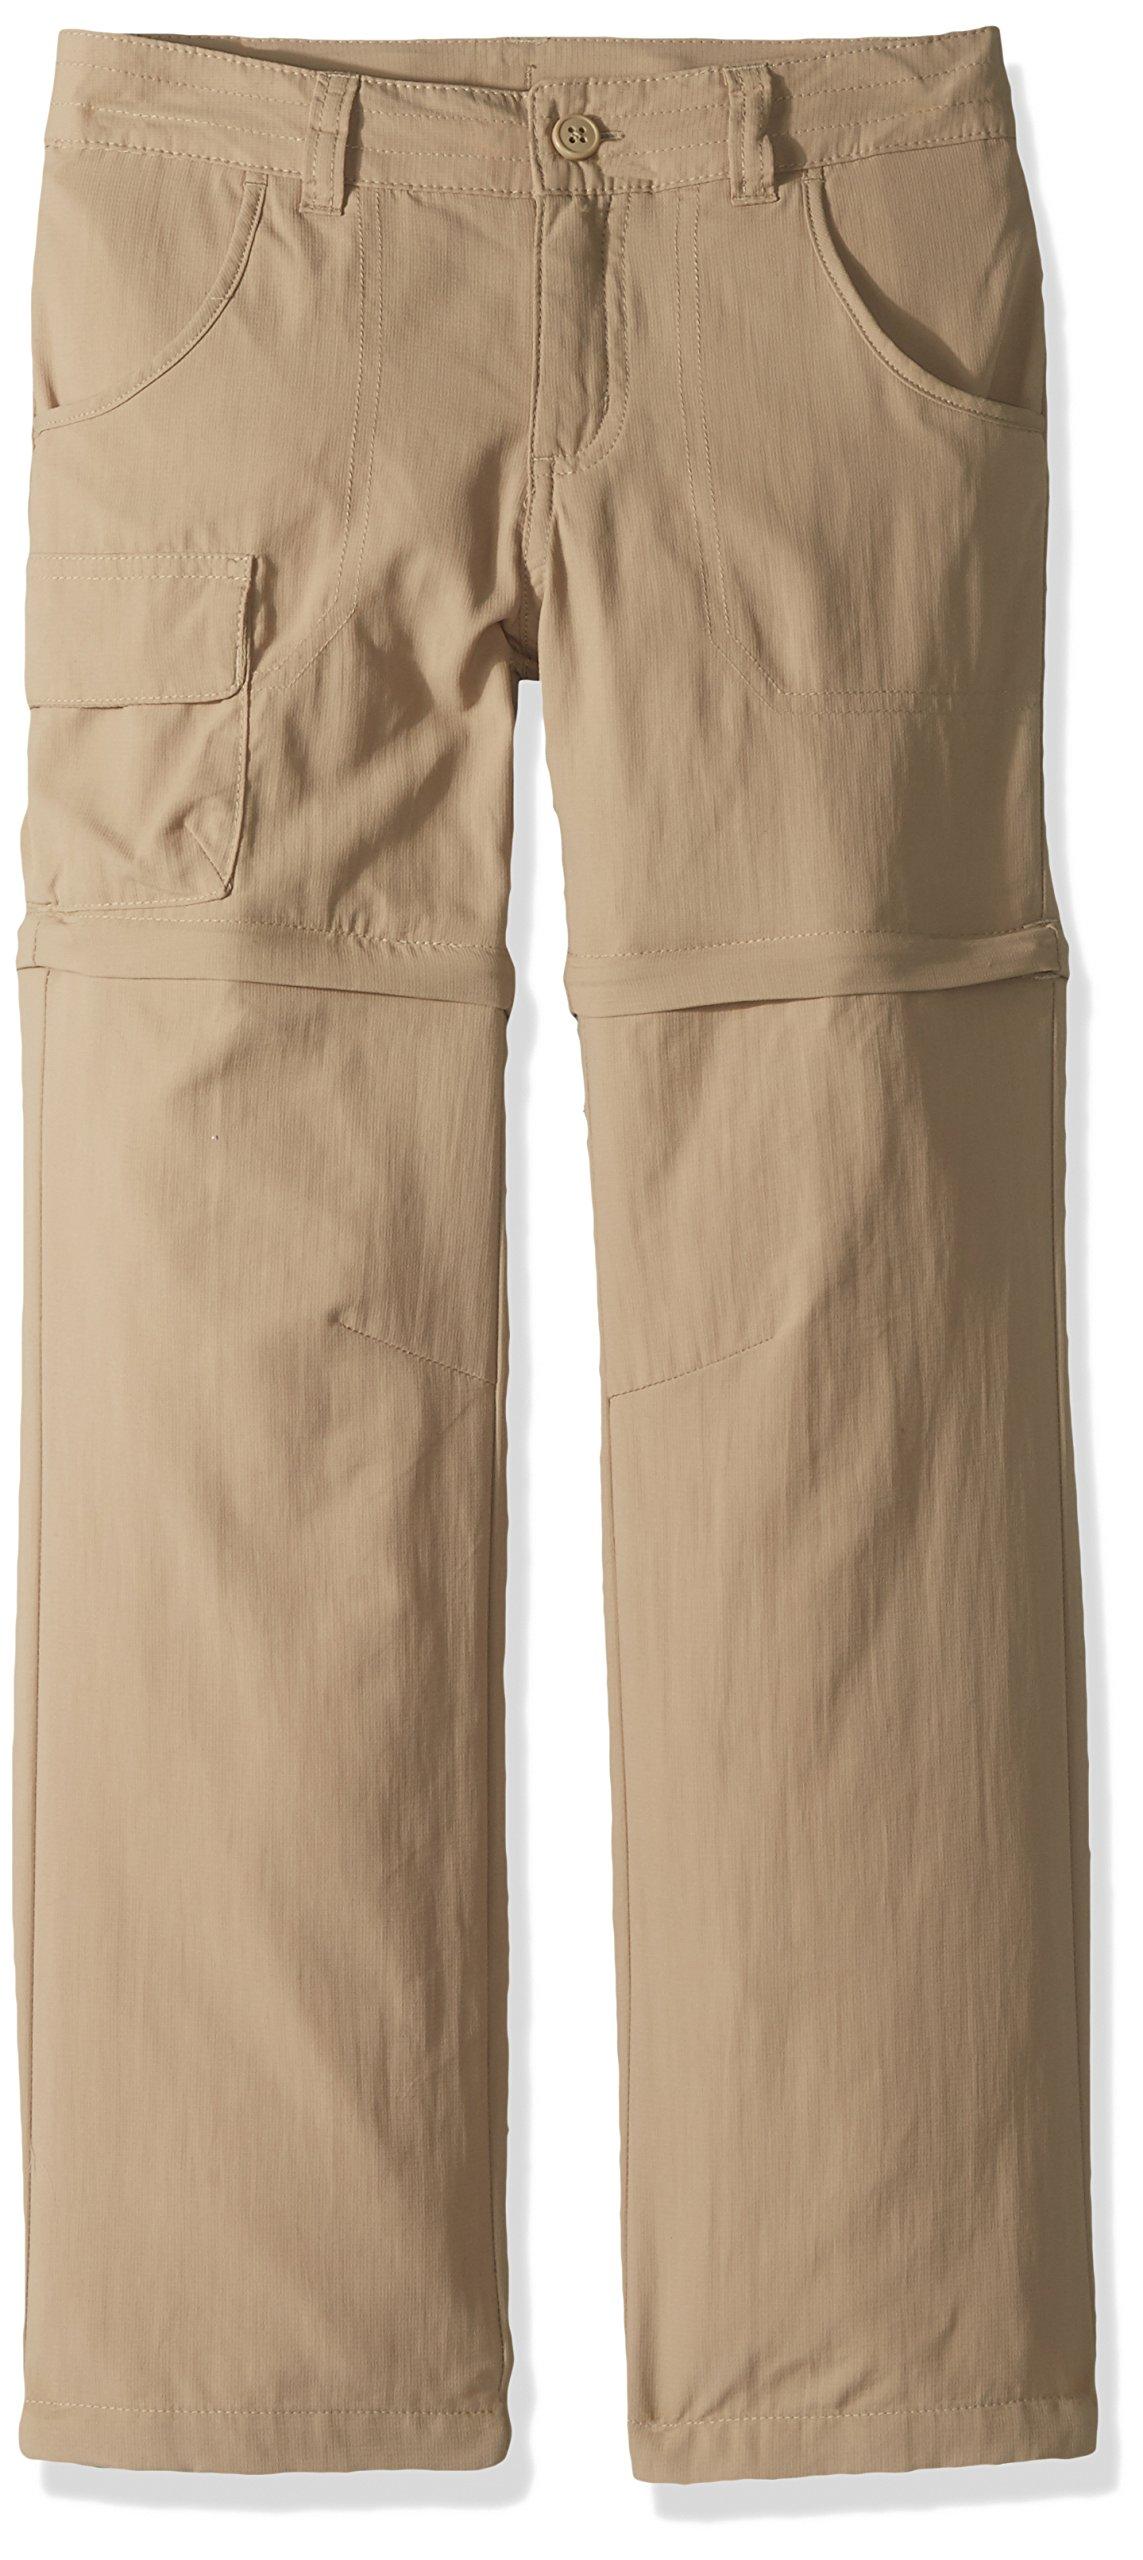 Columbia Boys' Silver Ridge III Convertible Sun Pants, Moisture Wicking